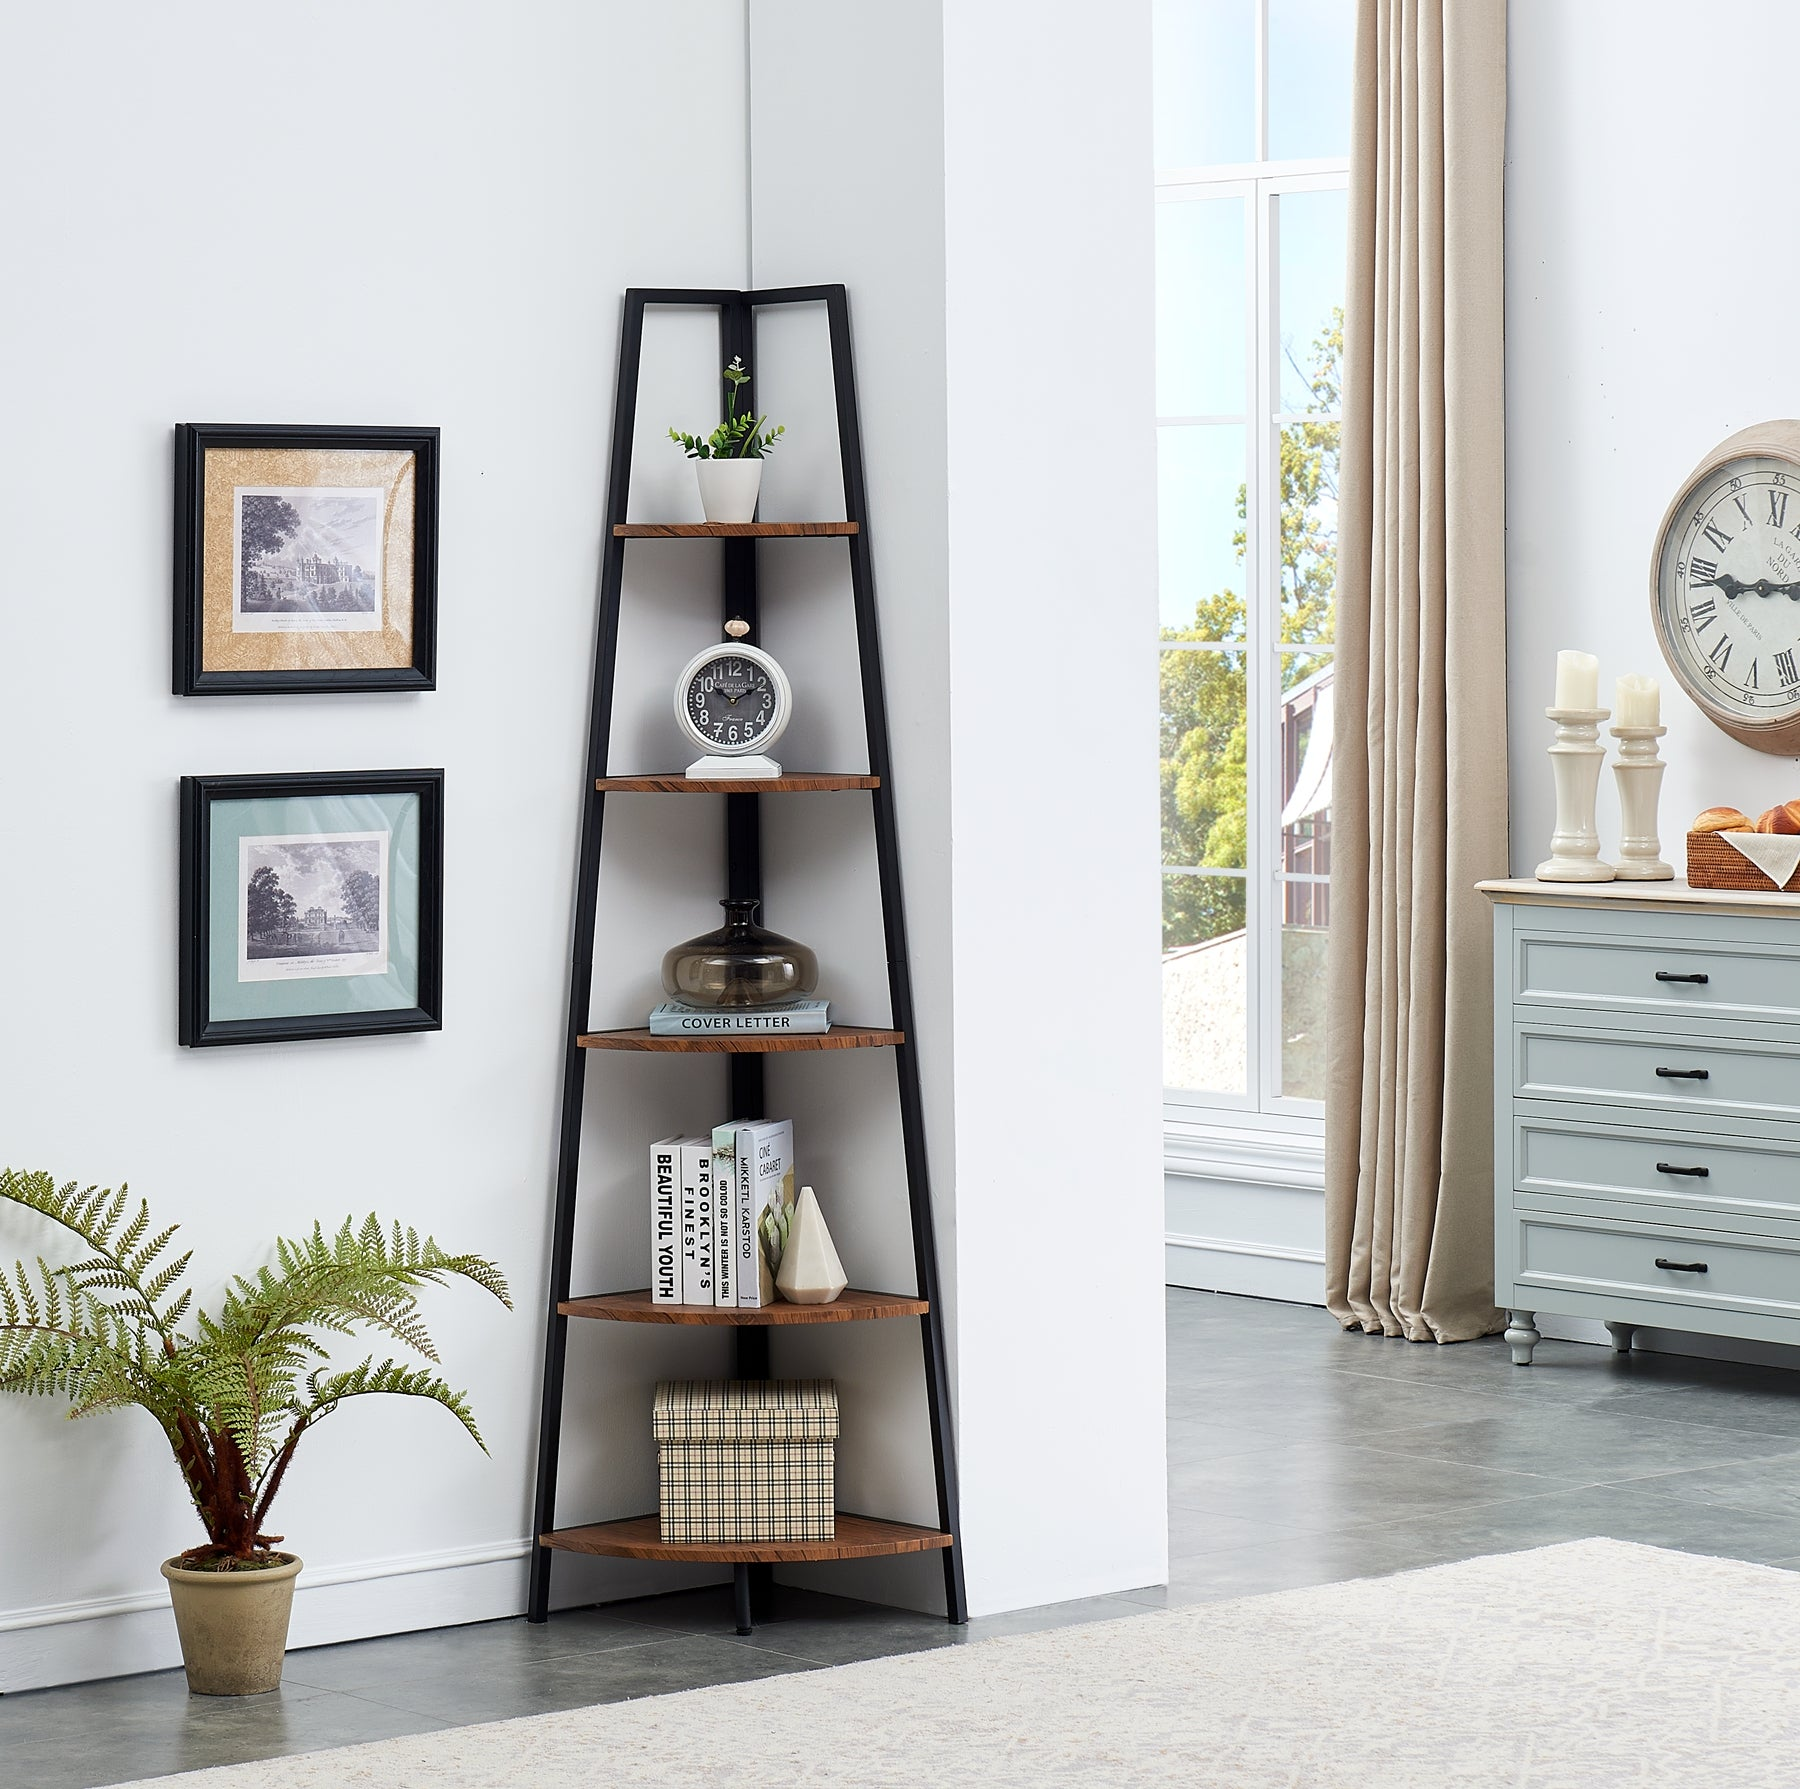 IHOMDEC 5 Tier A-Shaped Industrial Style Corner Shelves Retro Brown